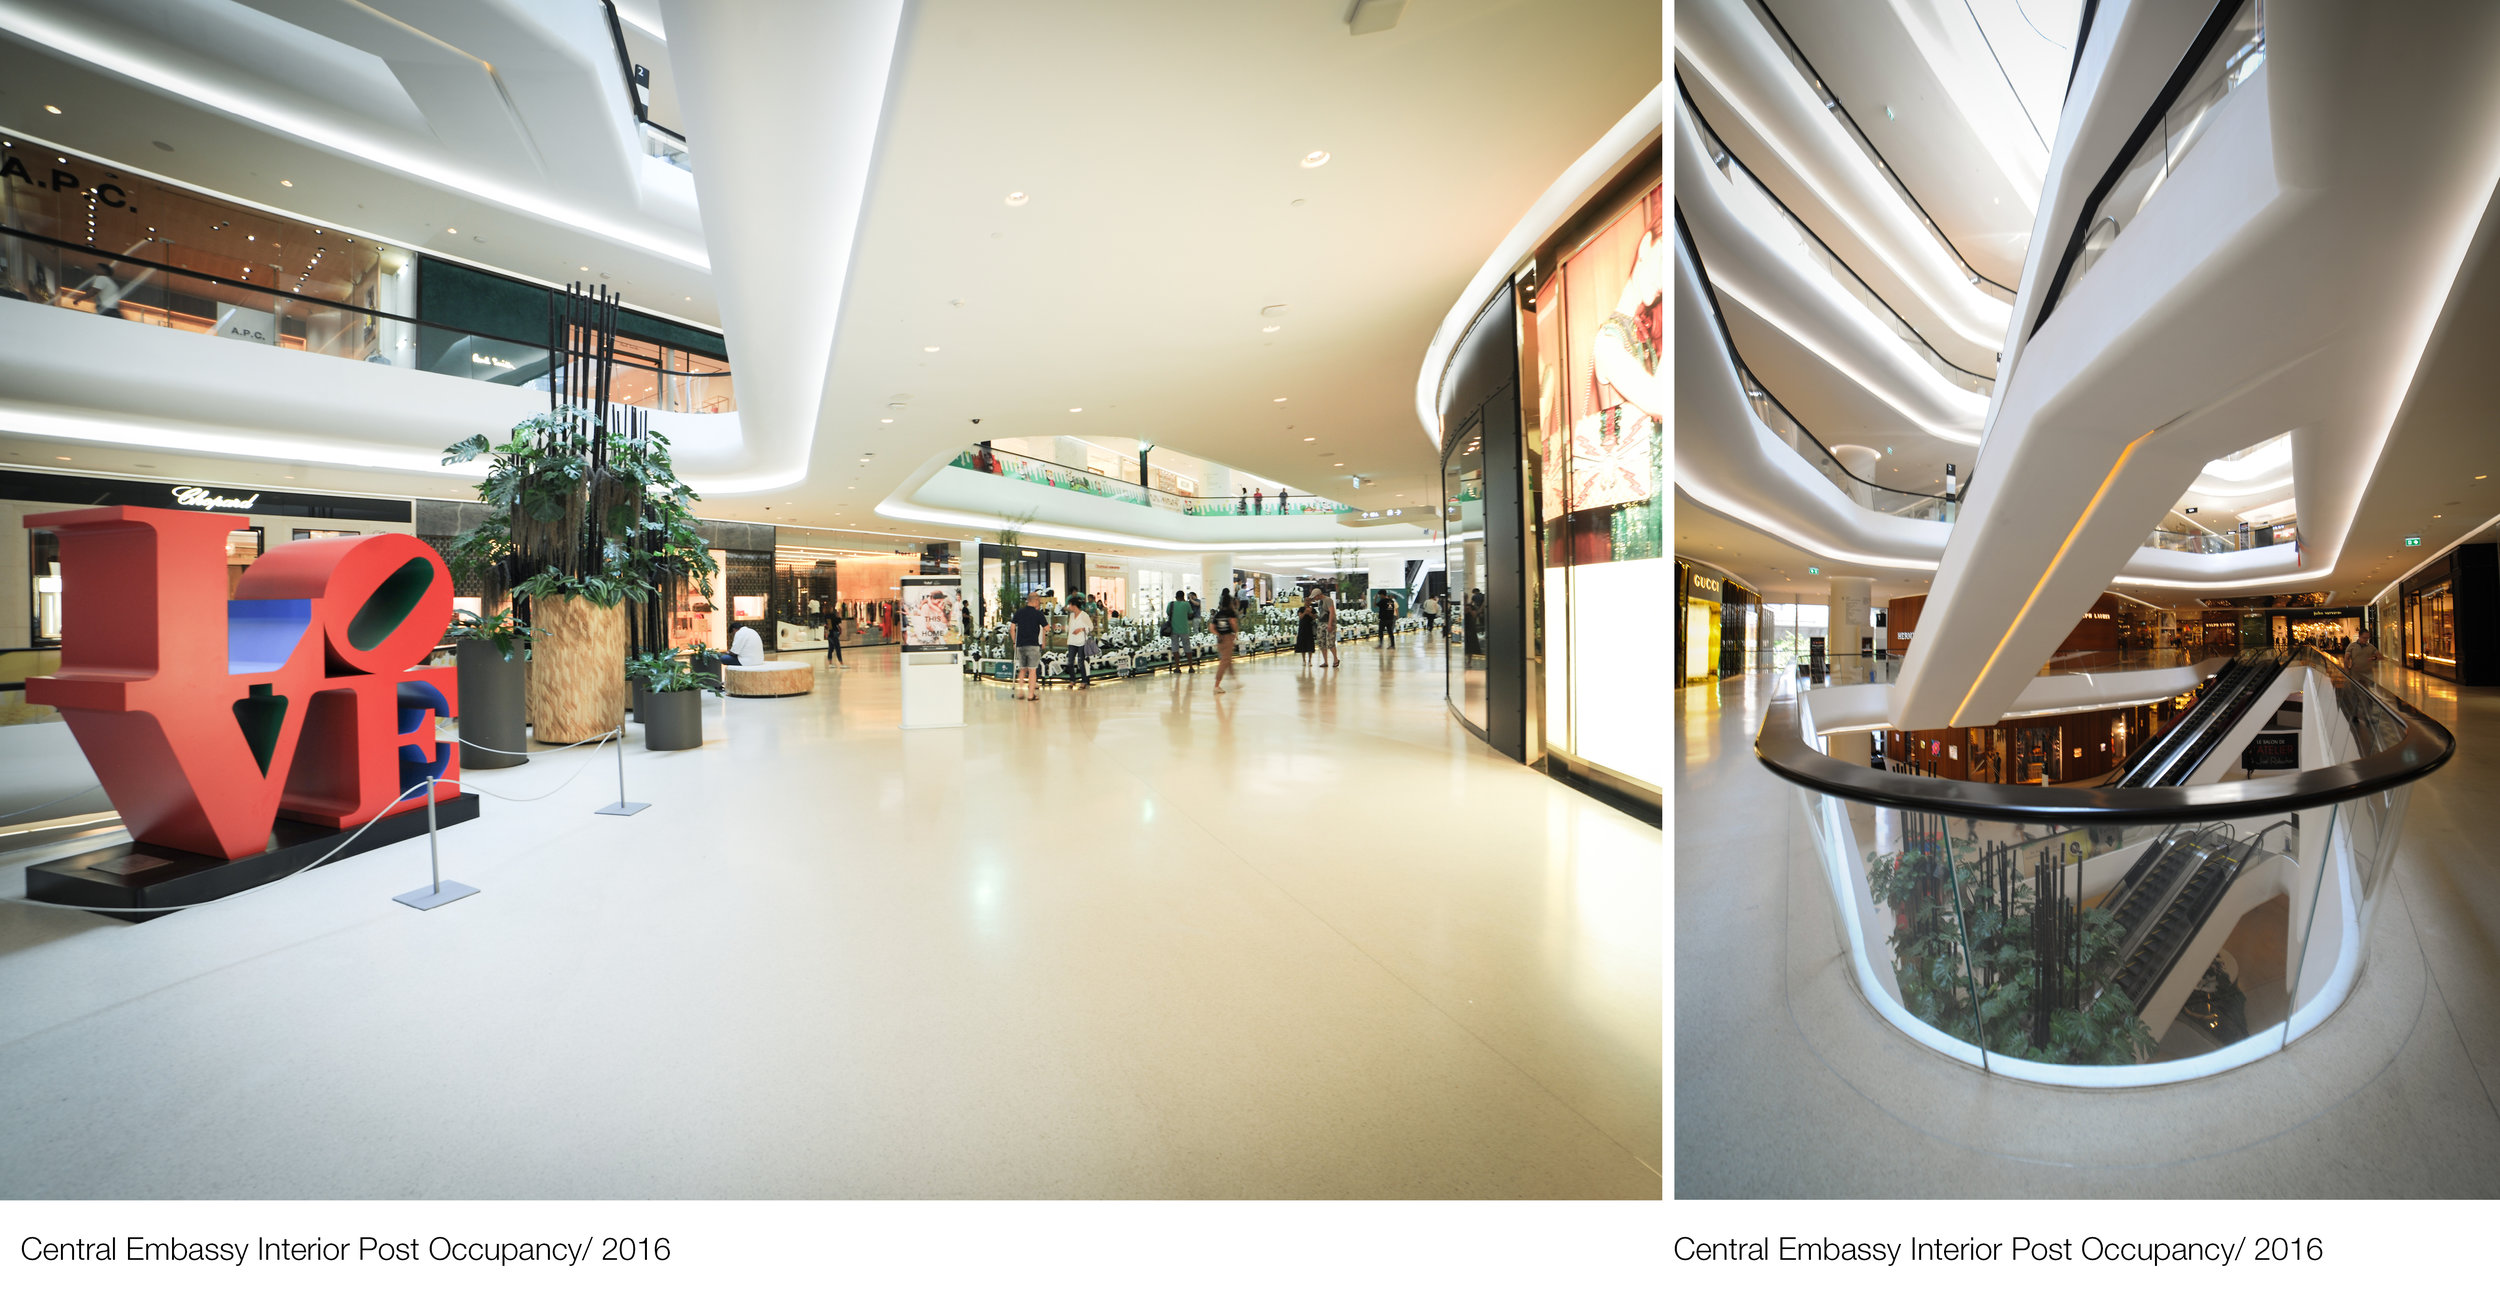 © Copyright Studio DS 2018 - Central Embassy Interior Design Post Occupancy